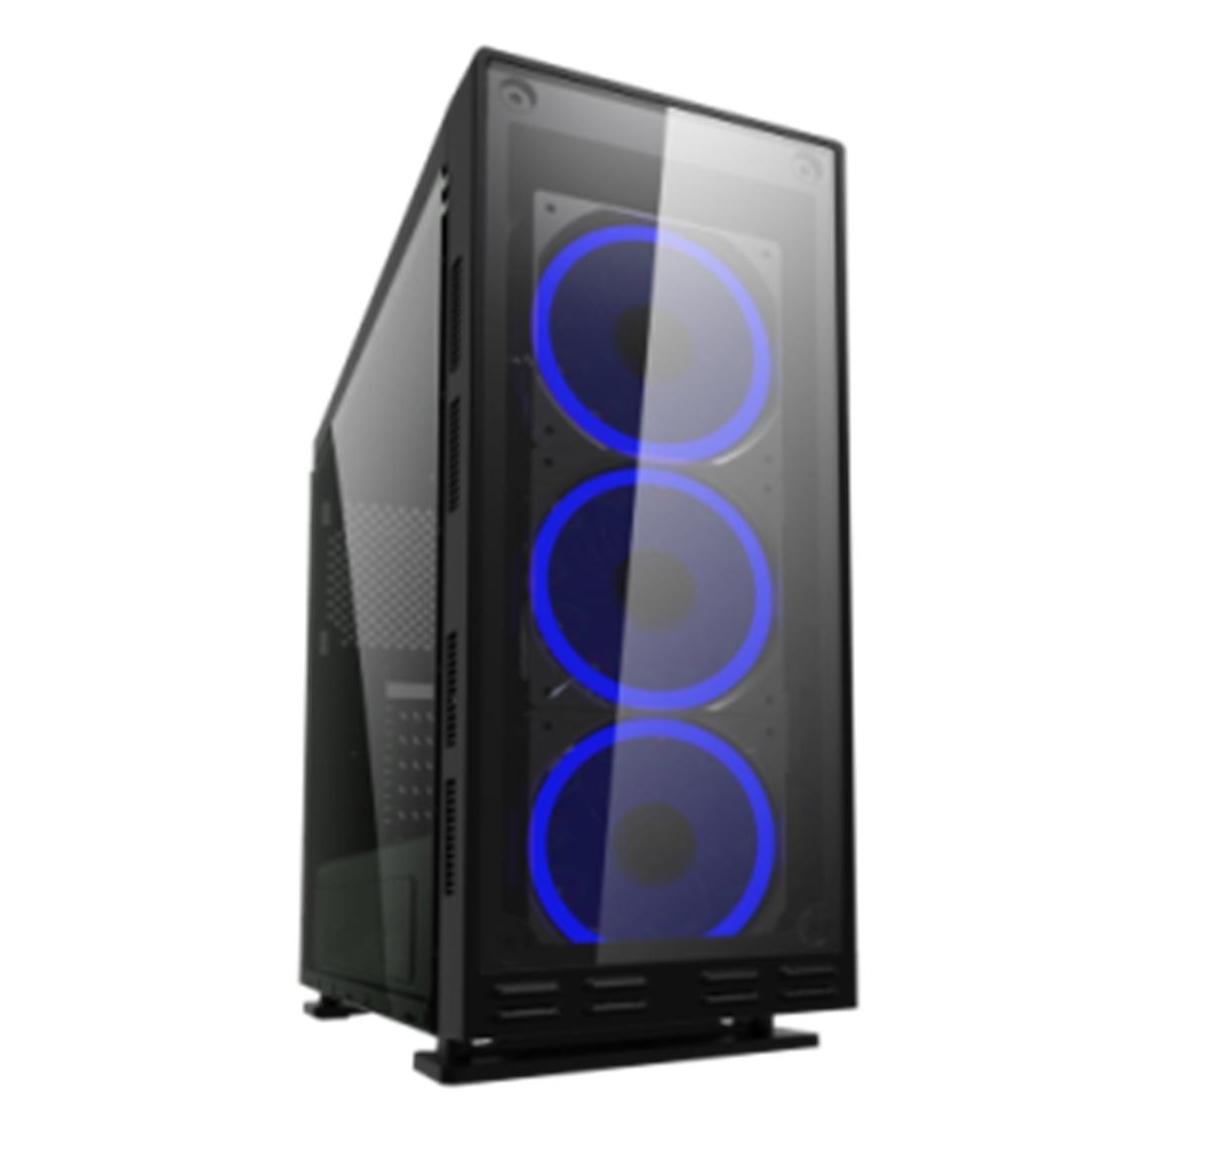 CAJA ORDENADOR GAMING COOLBOX DEEPFLASH RGB ATX USB